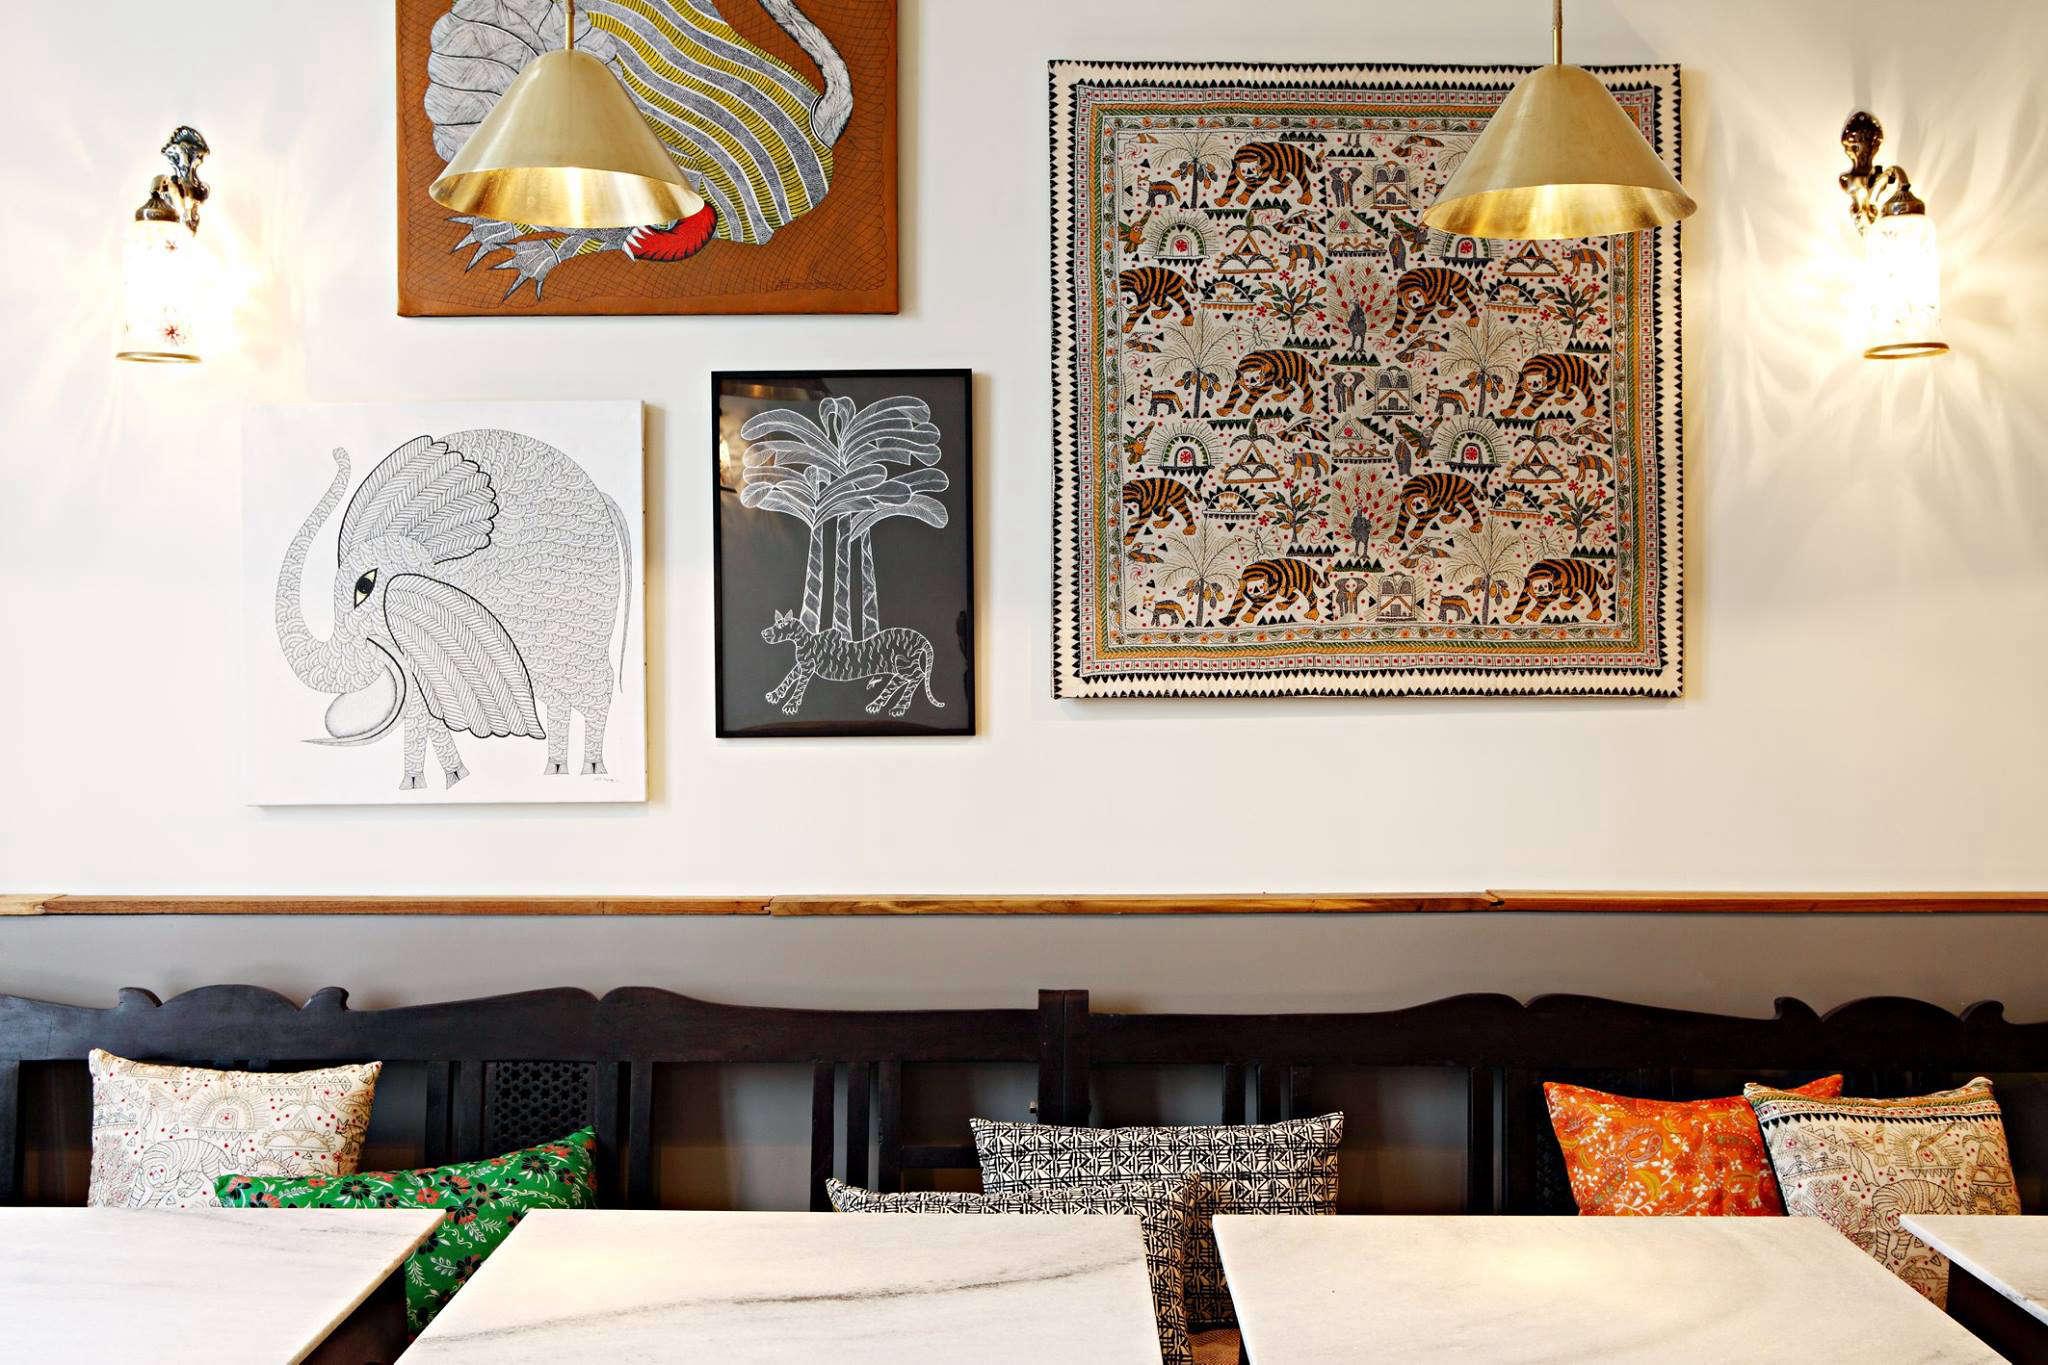 mg road indian restaurant in paris 14